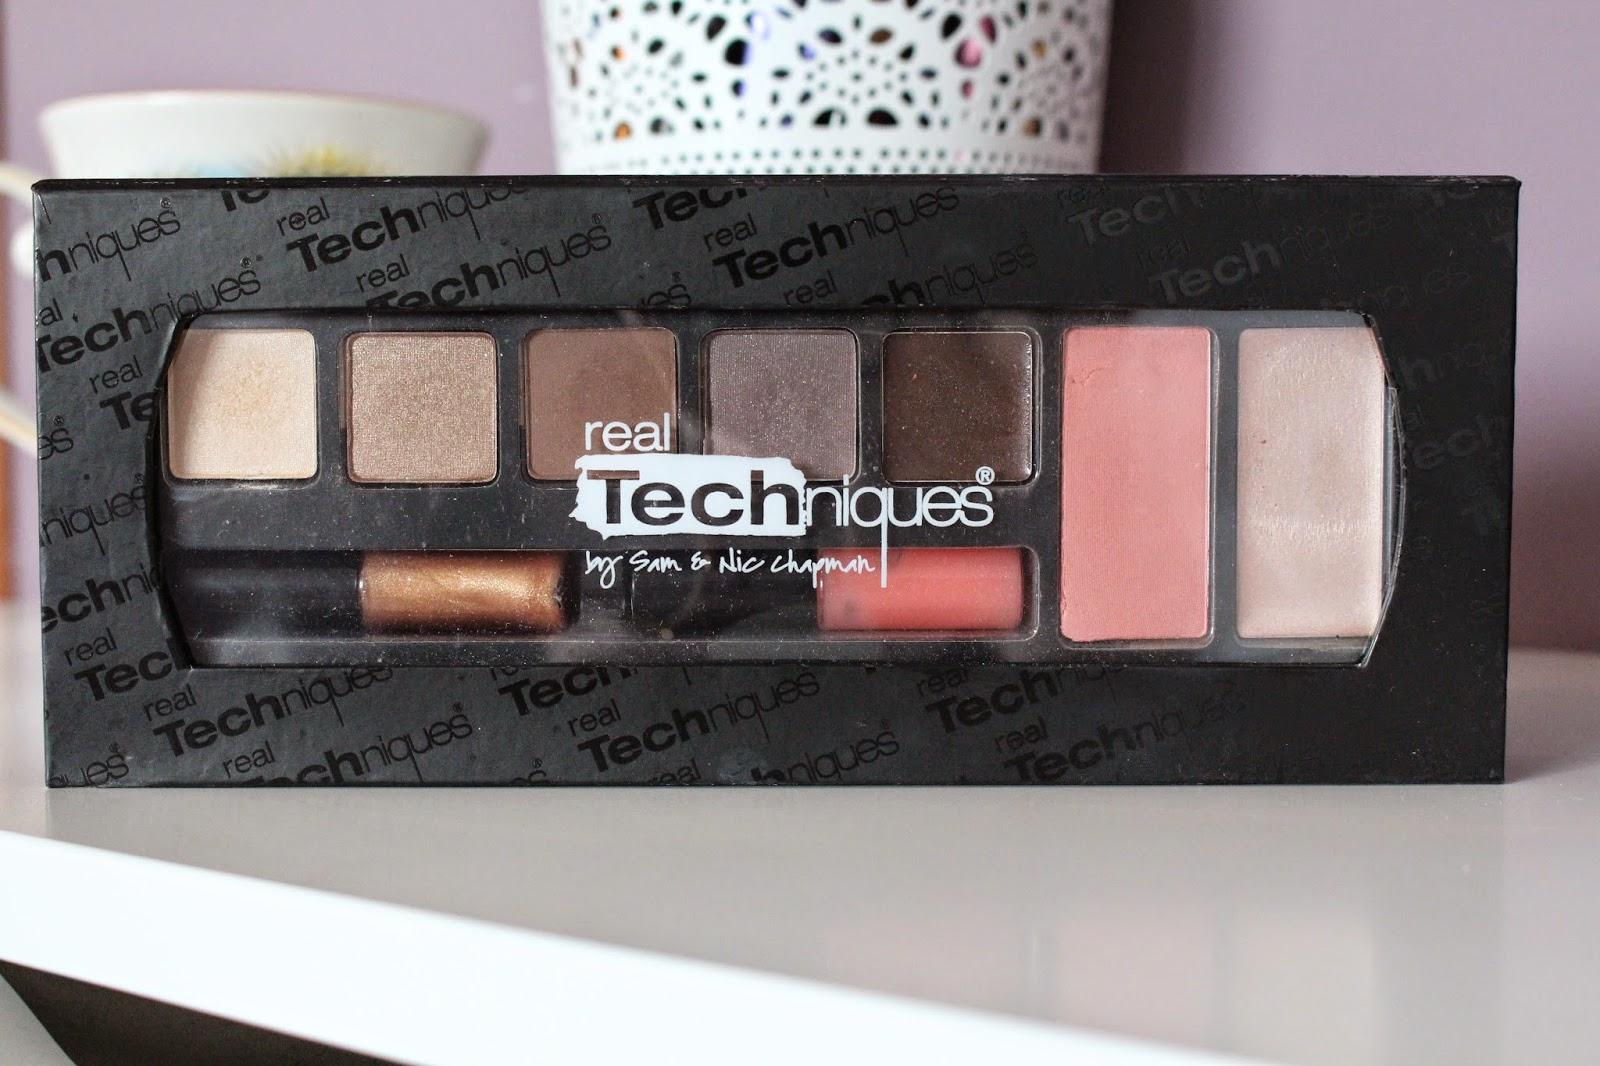 Real Techniques Modern Natural Makeup Kit! - claresloves